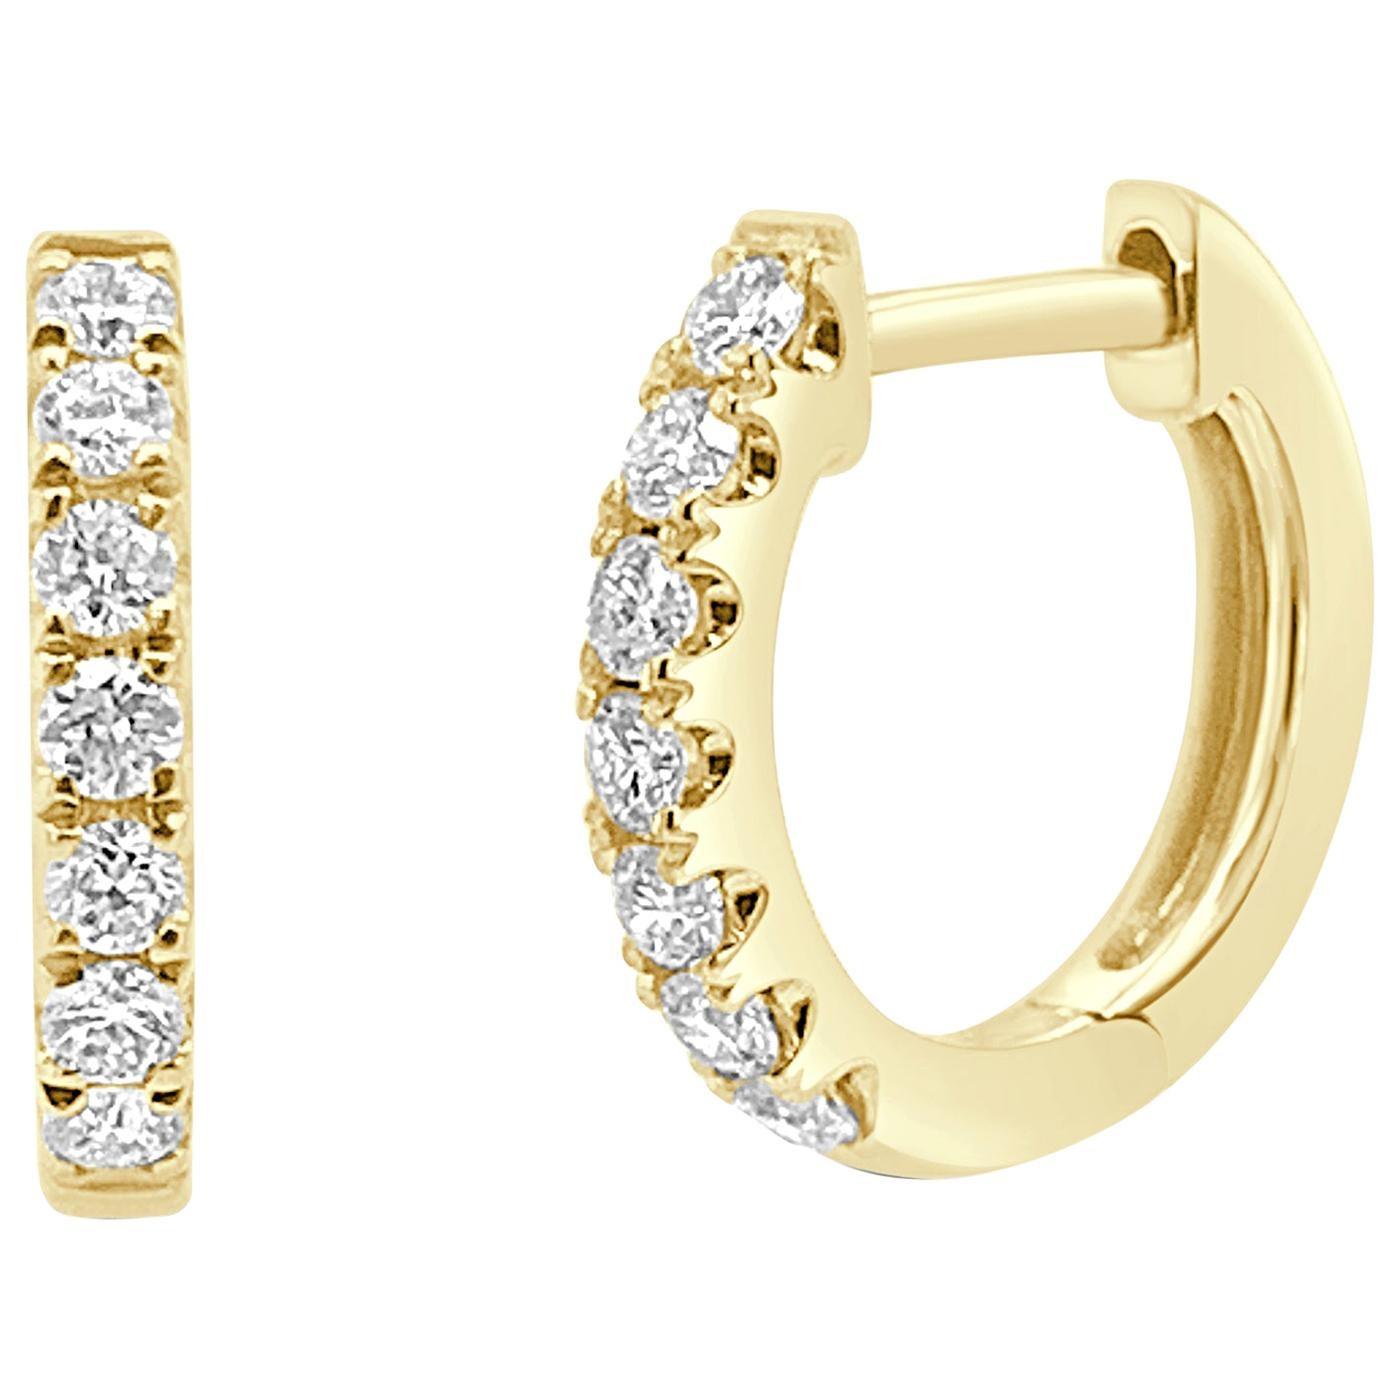 14 Karat Yellow Gold 0.20 Carat Diamond Huggie Earrings